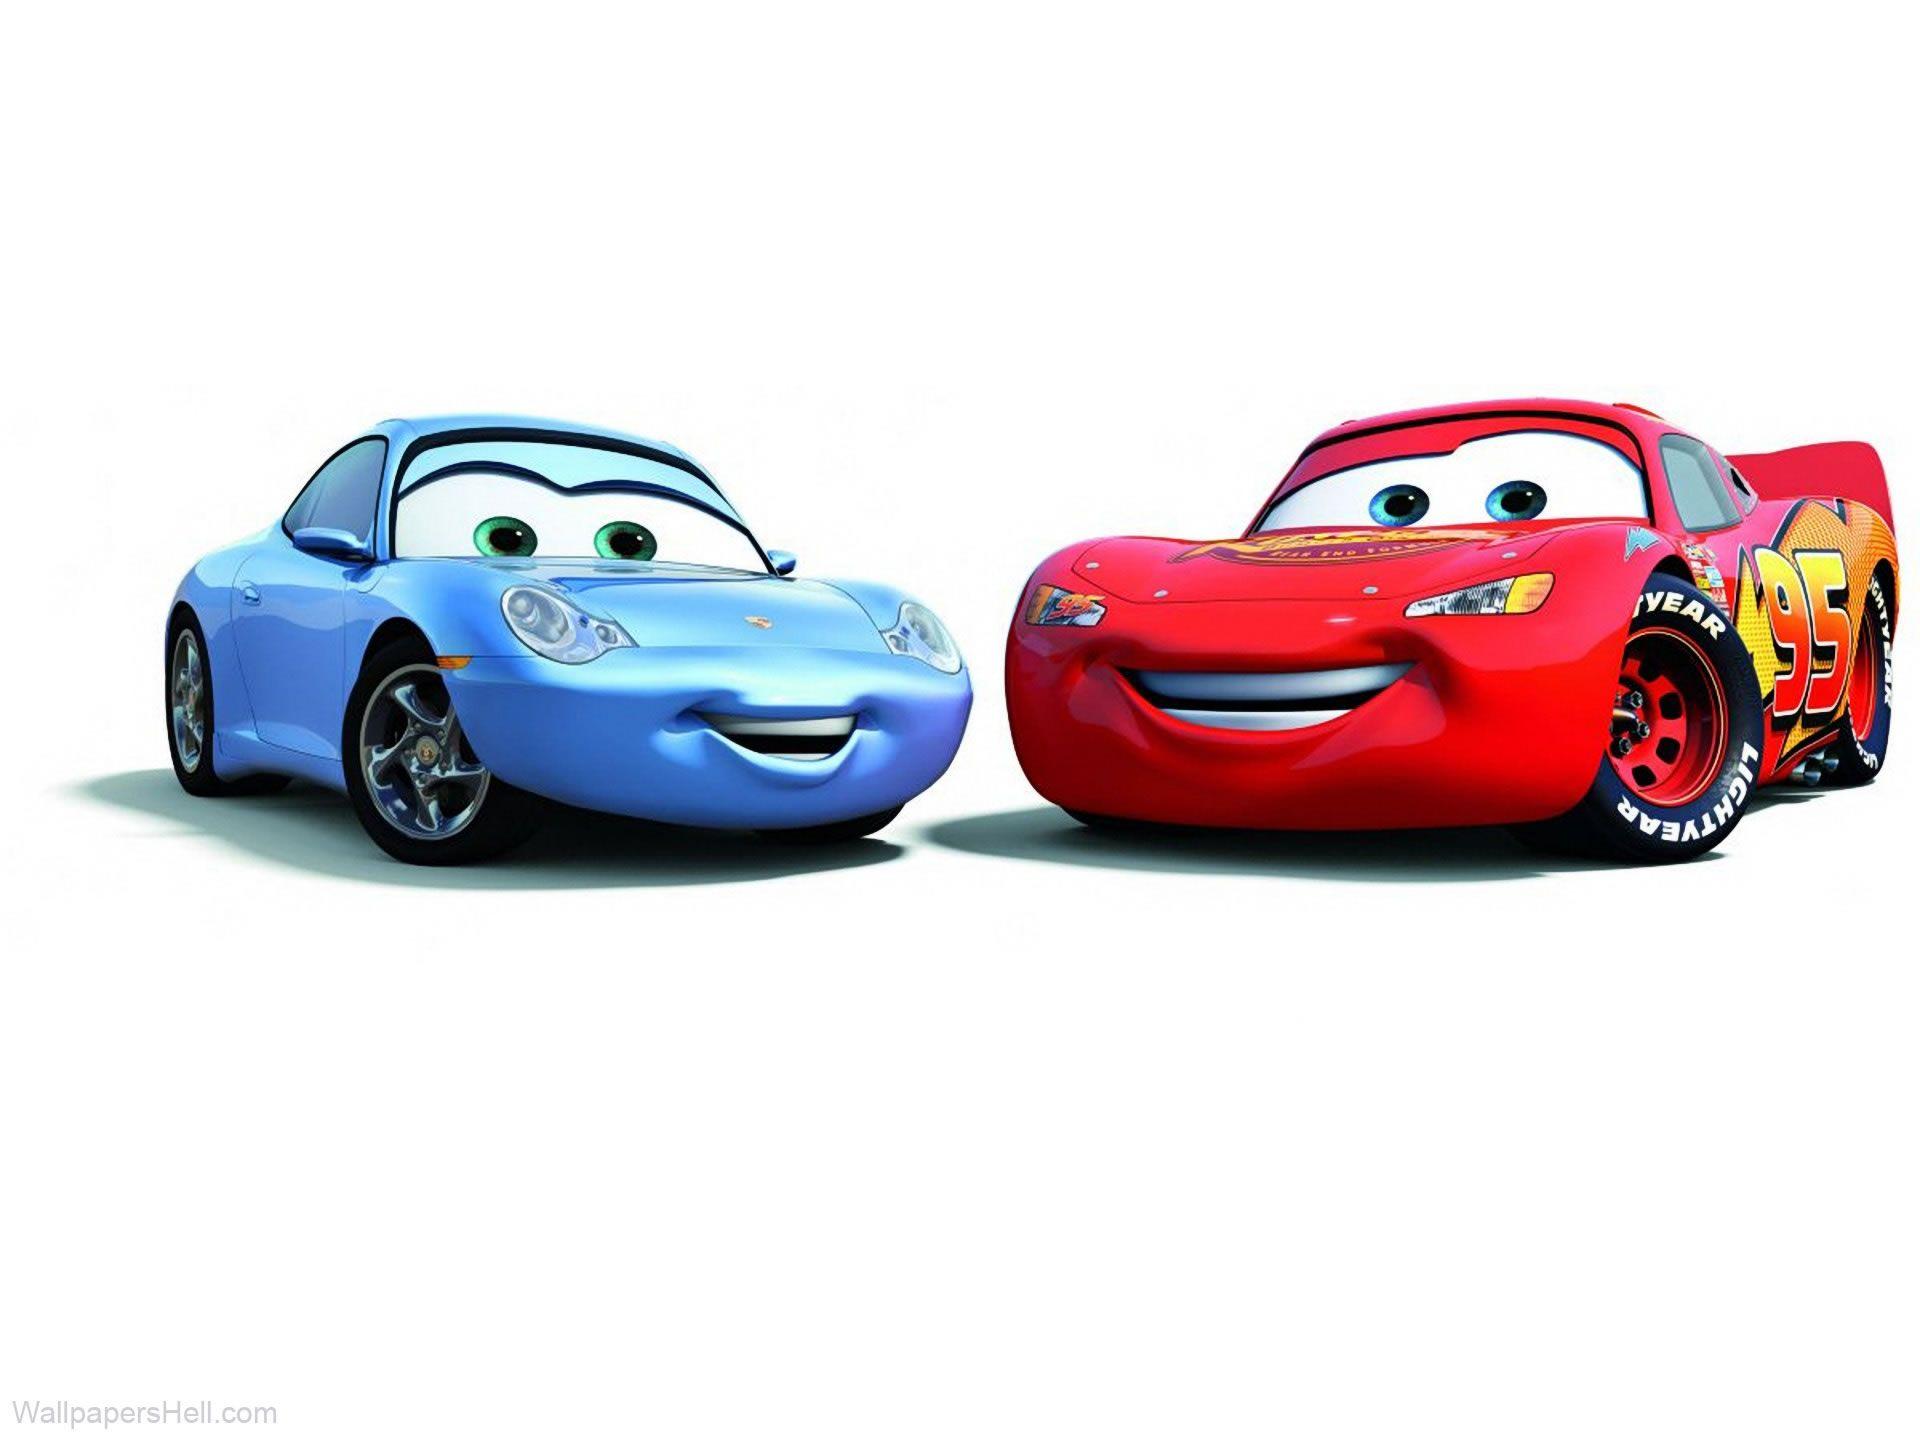 Hd Car Wallpapers Free Download Zip Disney Cars Cars Pinterest Cars Car Wallpapers And